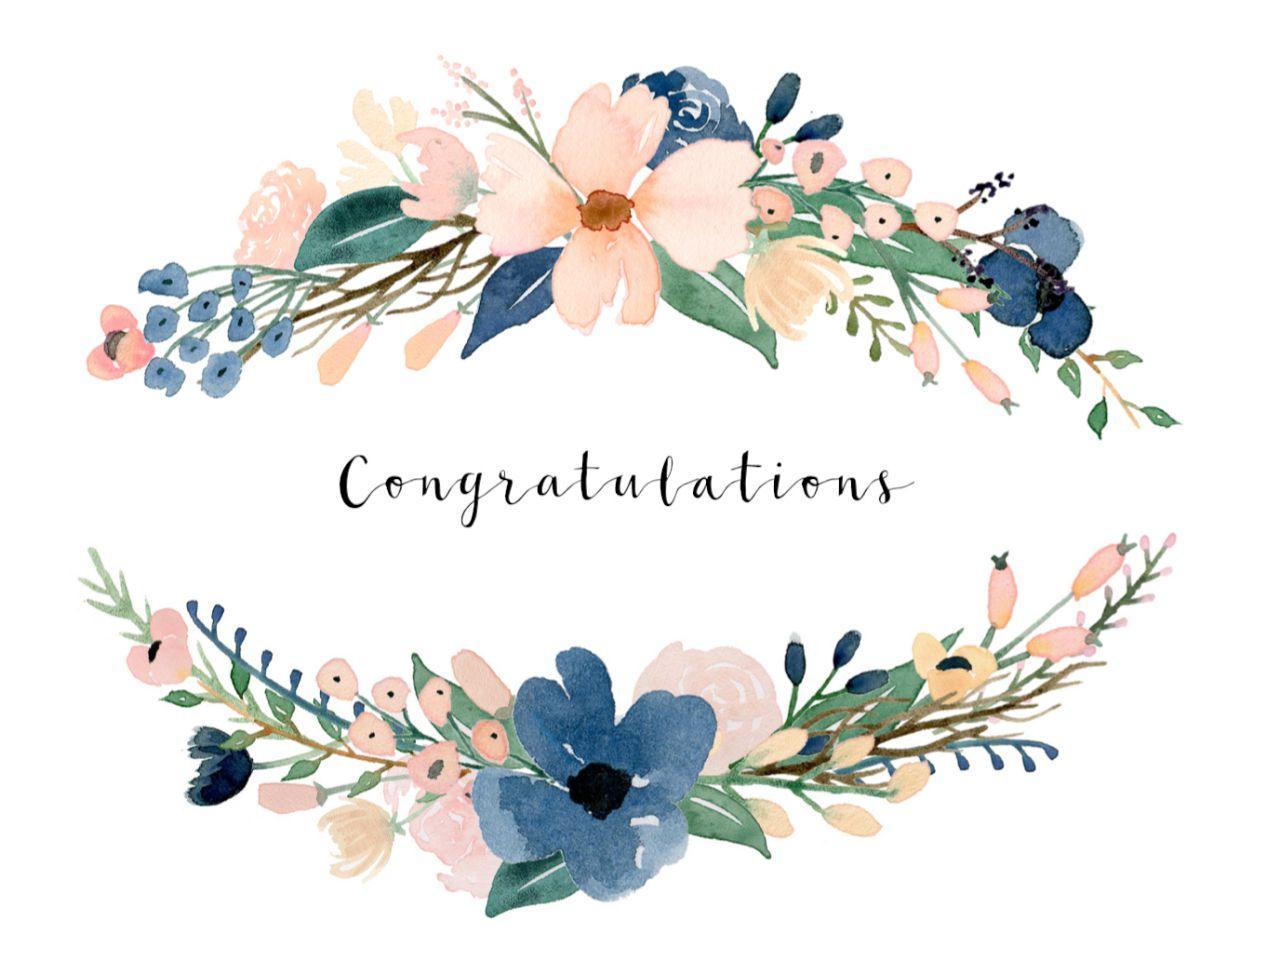 Free, Printable Wedding Cards That Say Congrats - Wedding Wish Cards Printable Free